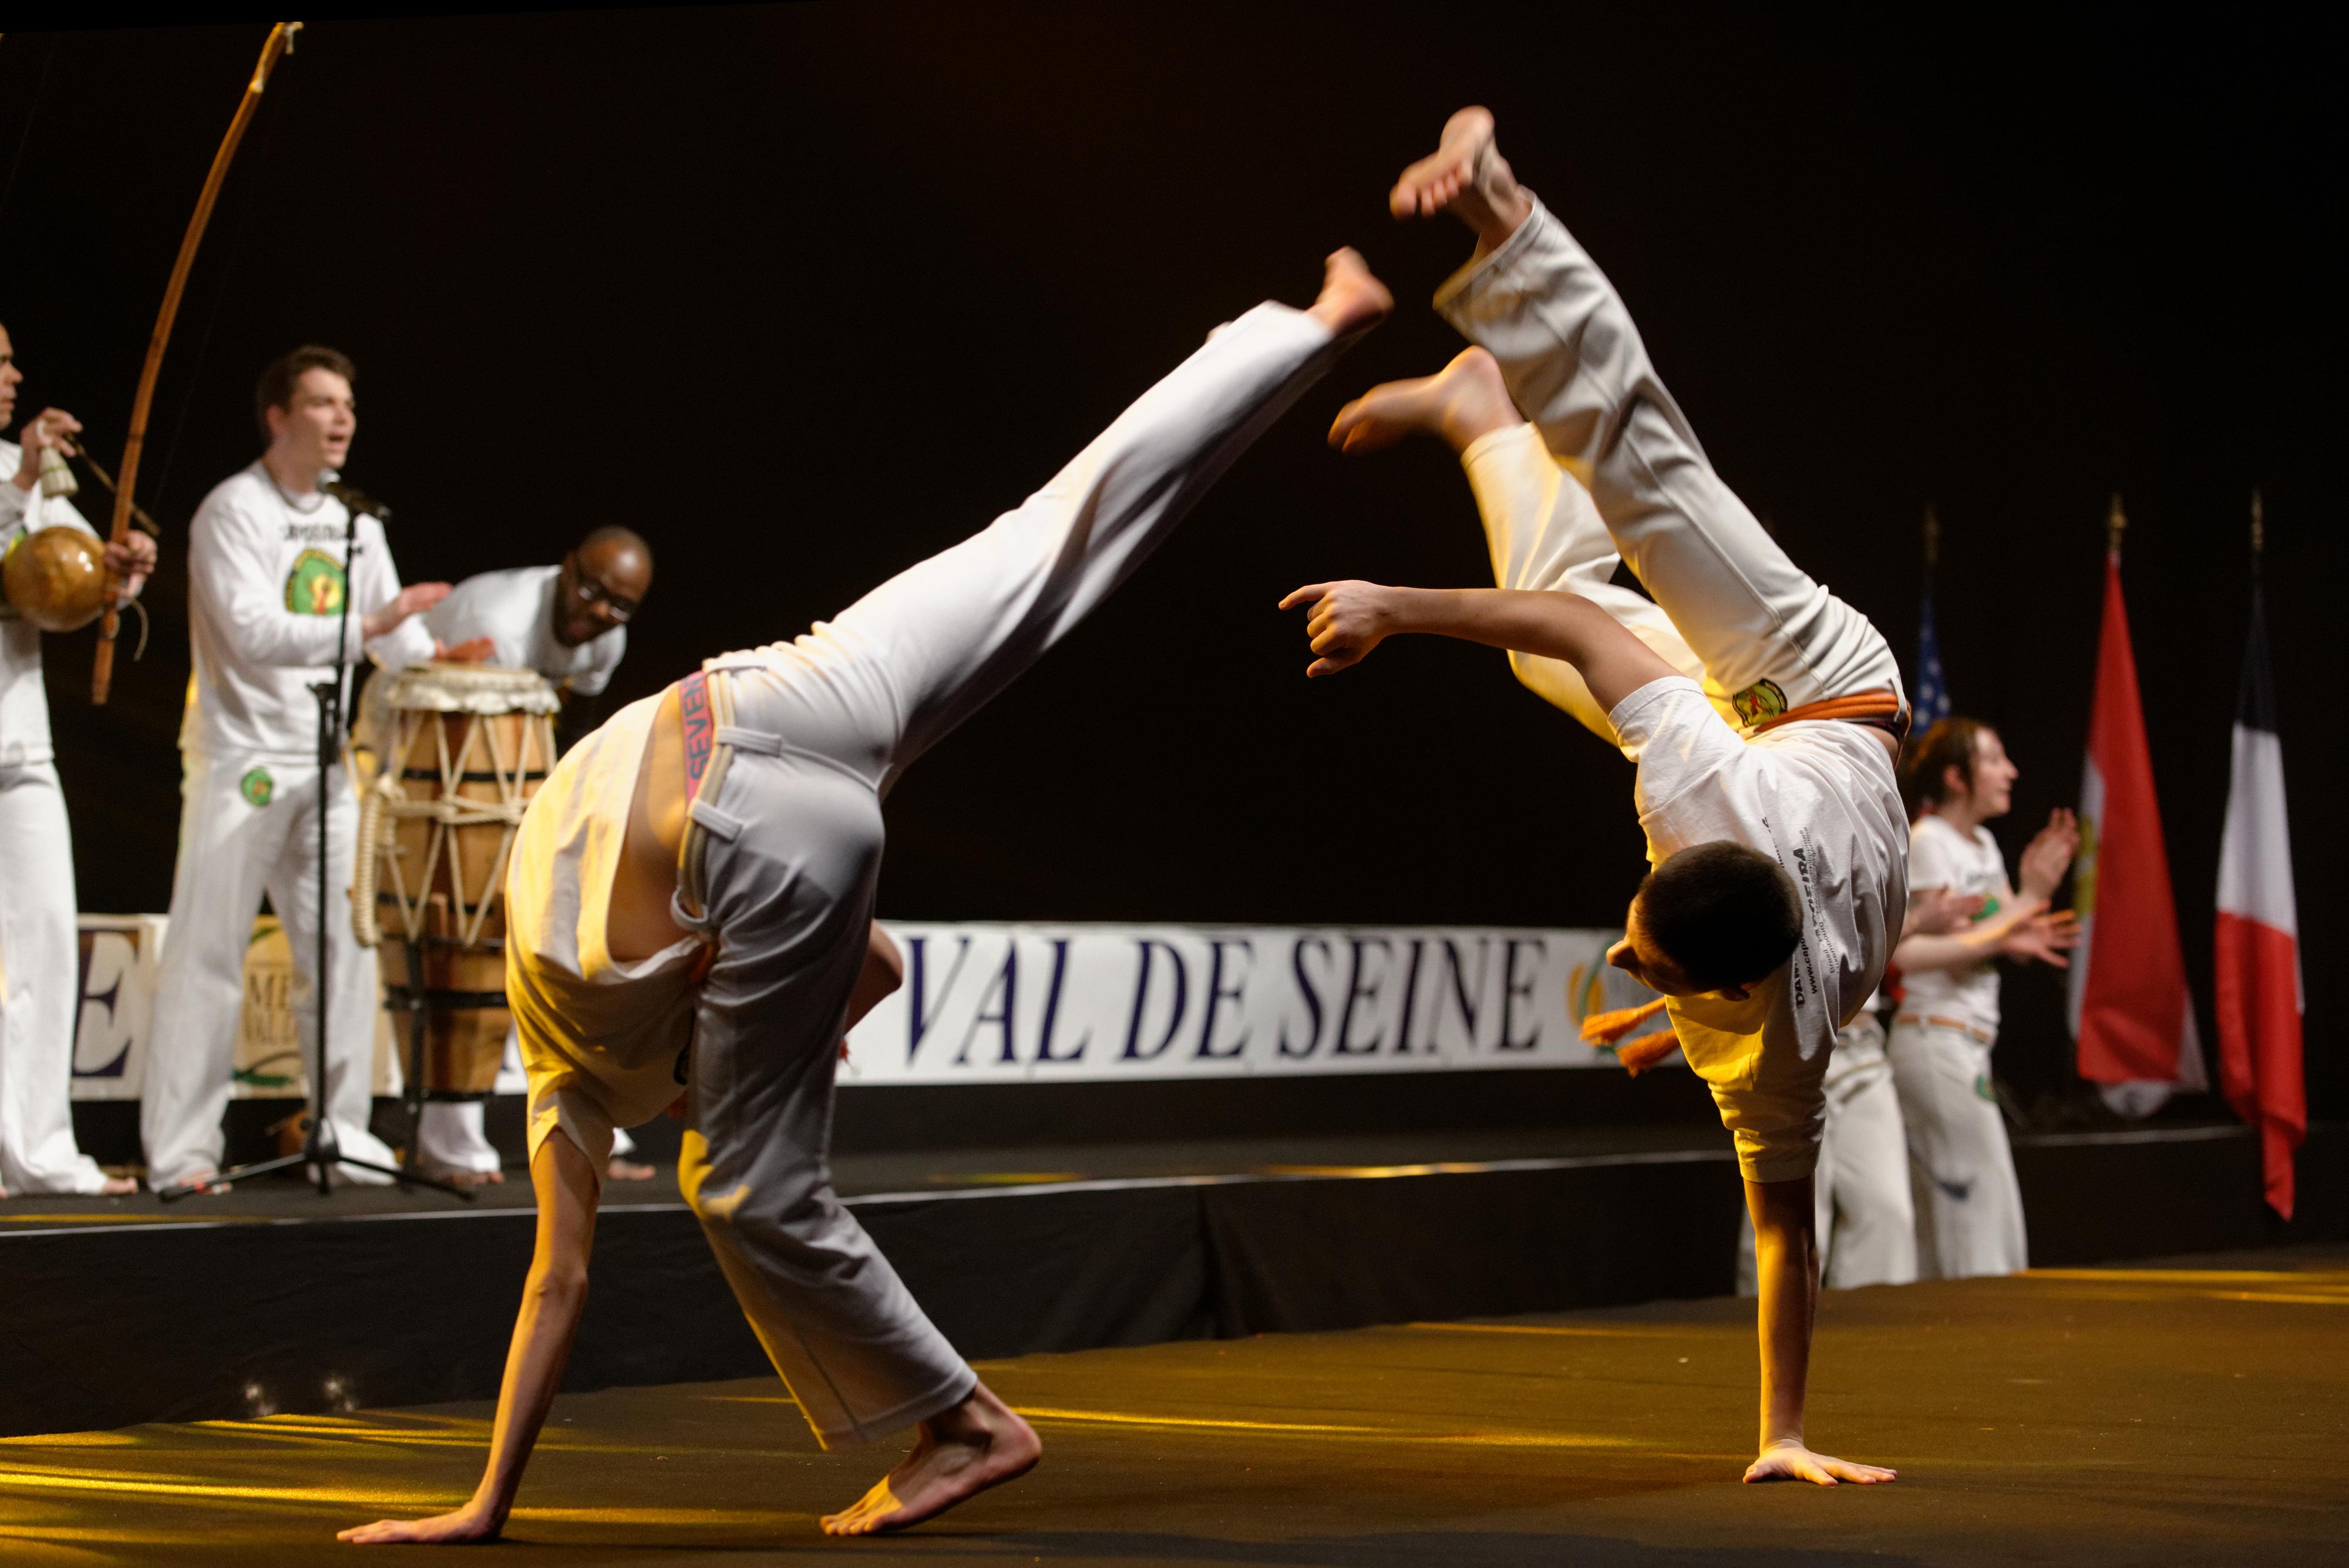 Capoeira demonstration Master de fleuret 2013 t221458.jpg